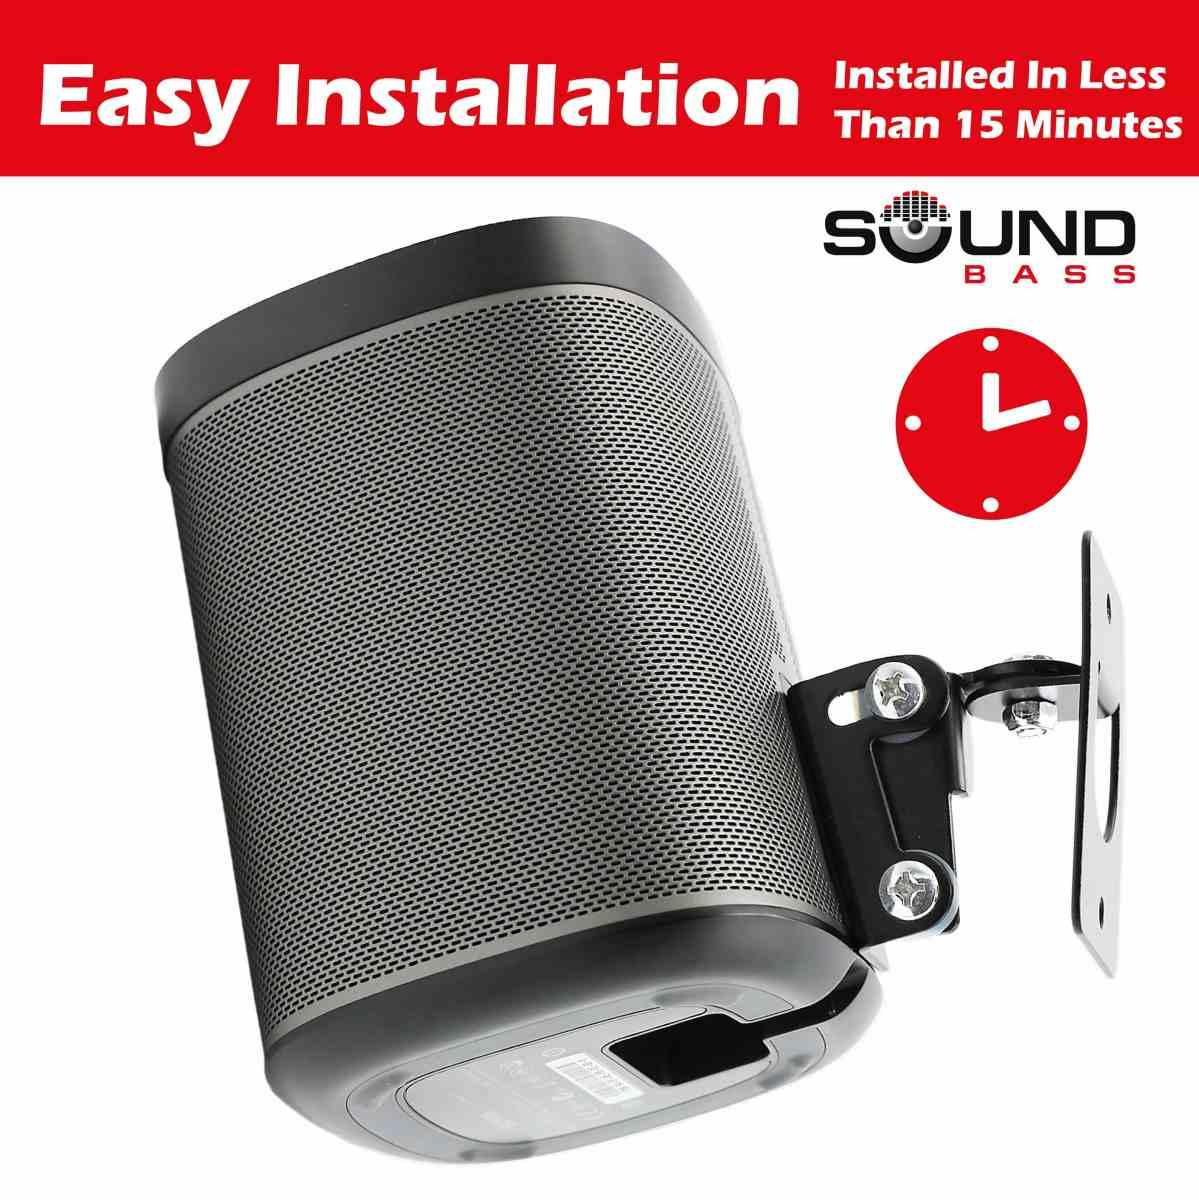 SOUNDBASS-SONOS-PLAY1-WALL-MOUNT-BRACKET